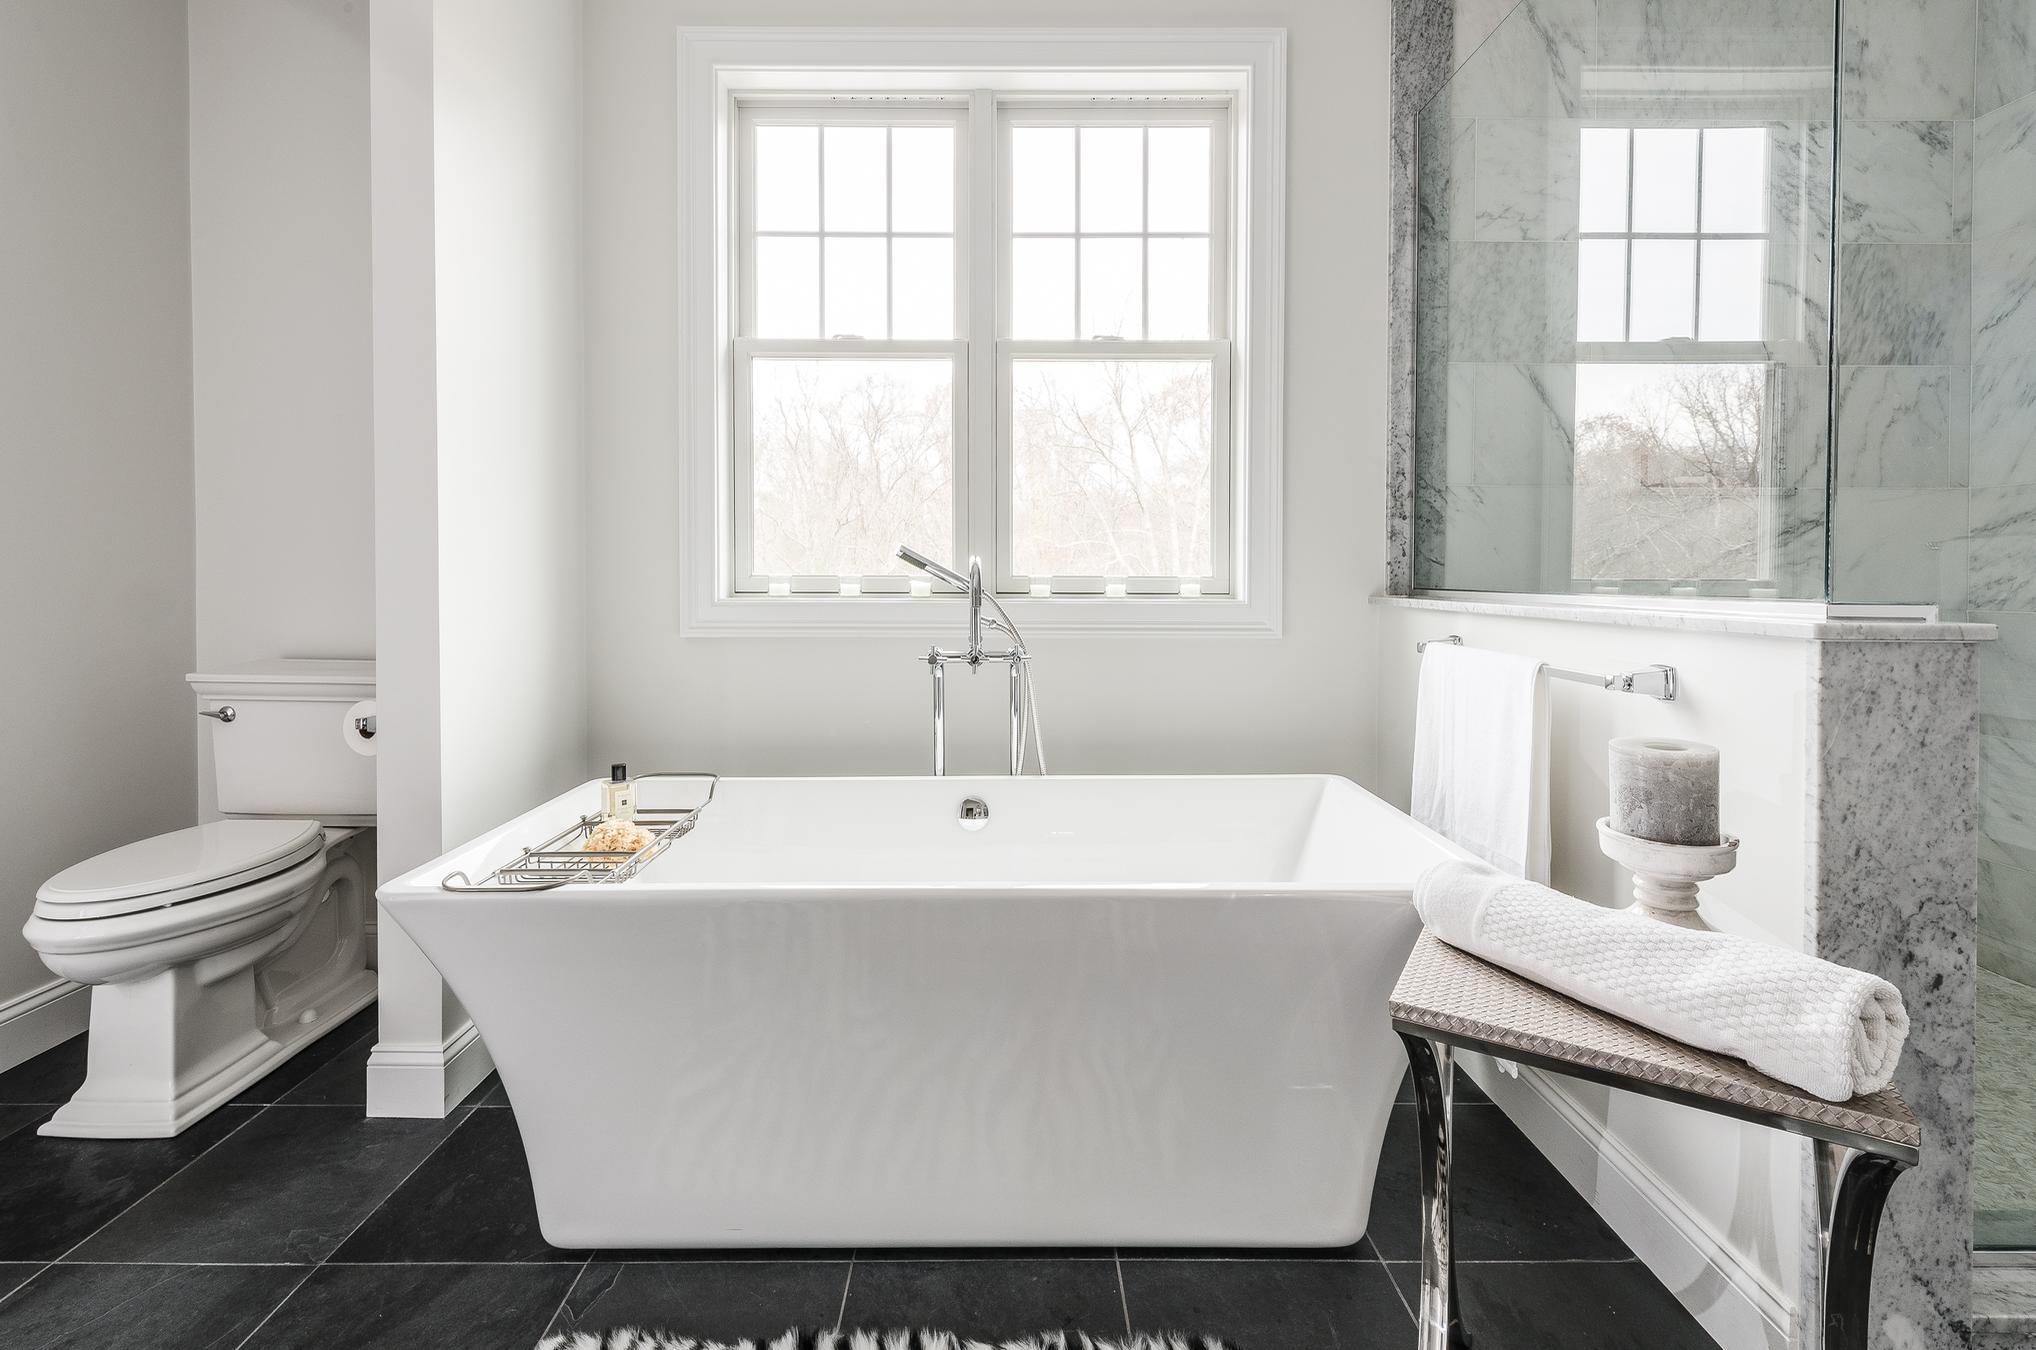 brushed nickel towel bar,Carrara Marble shower floor and niche ...